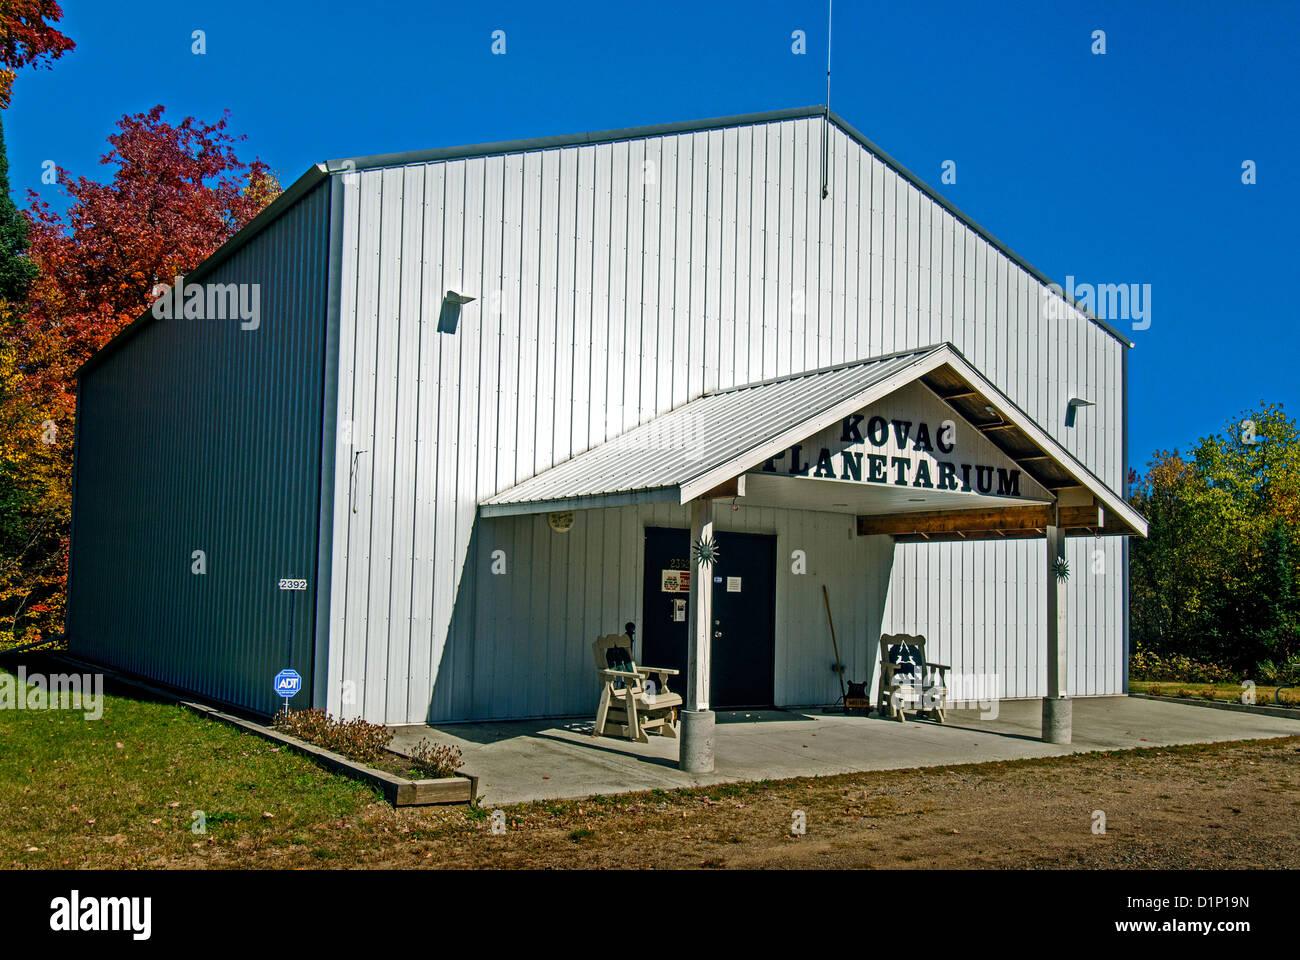 Kovac Planetarium in the Northwoods town of Rhinelander, Wisconsin - Stock Image